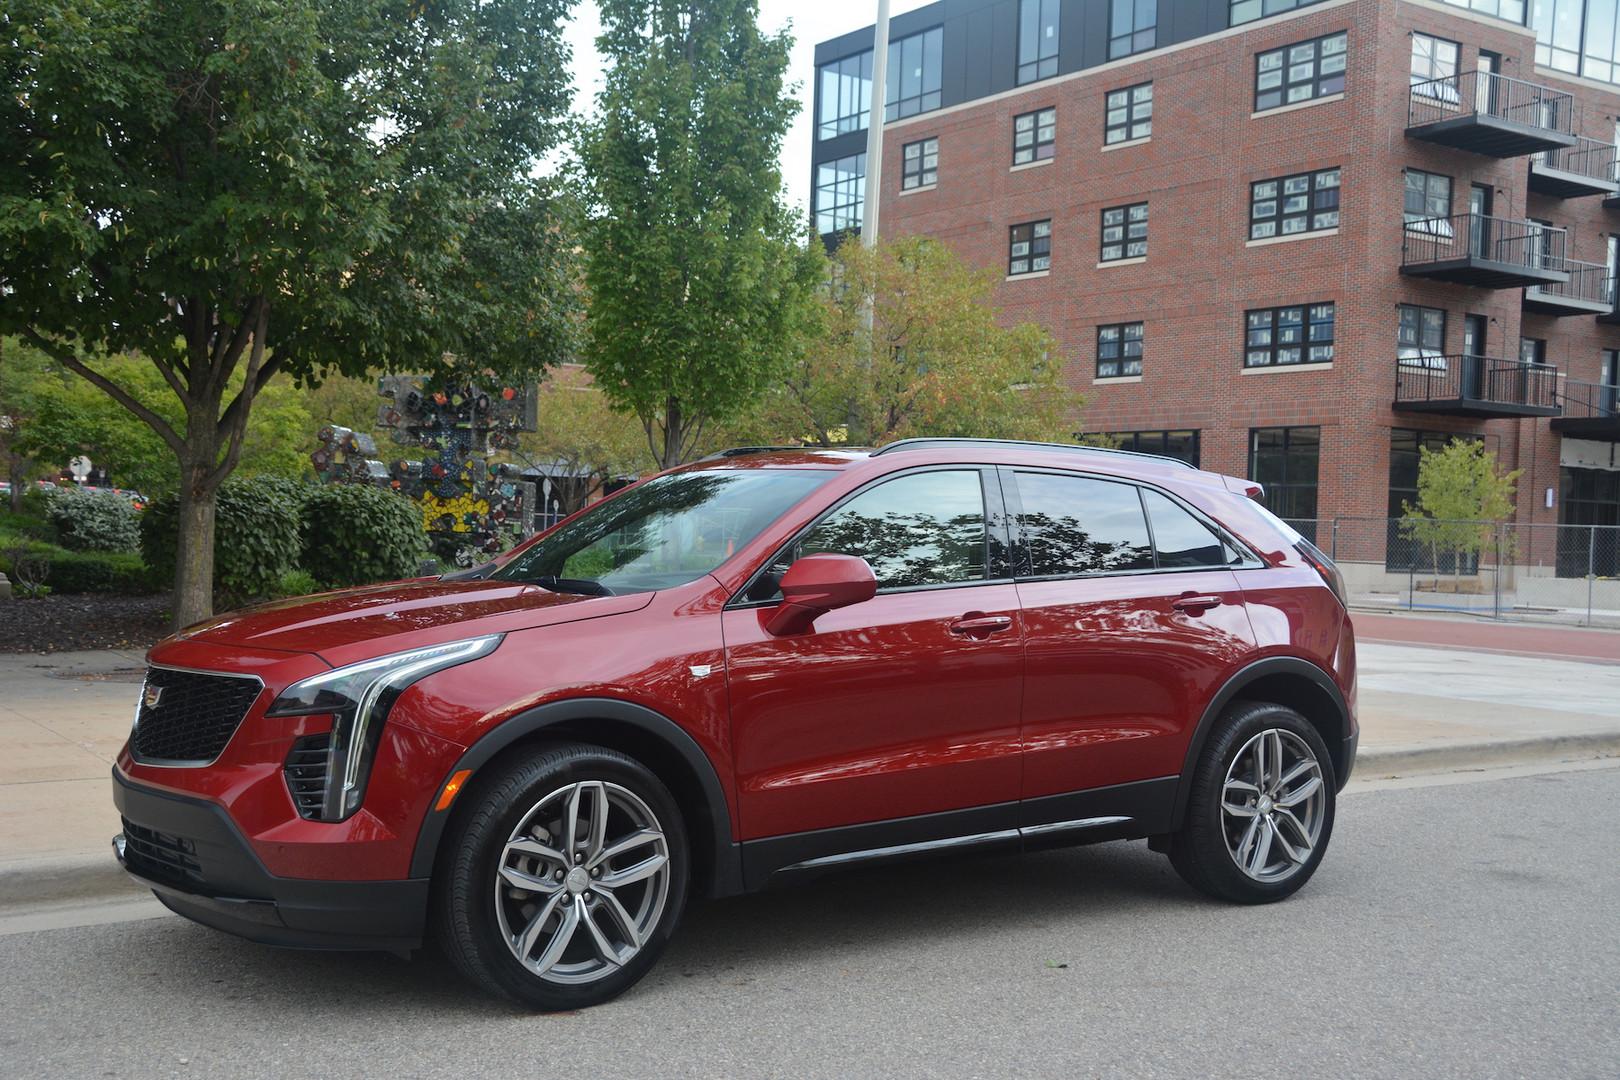 2019 Cadillac XT4 Red